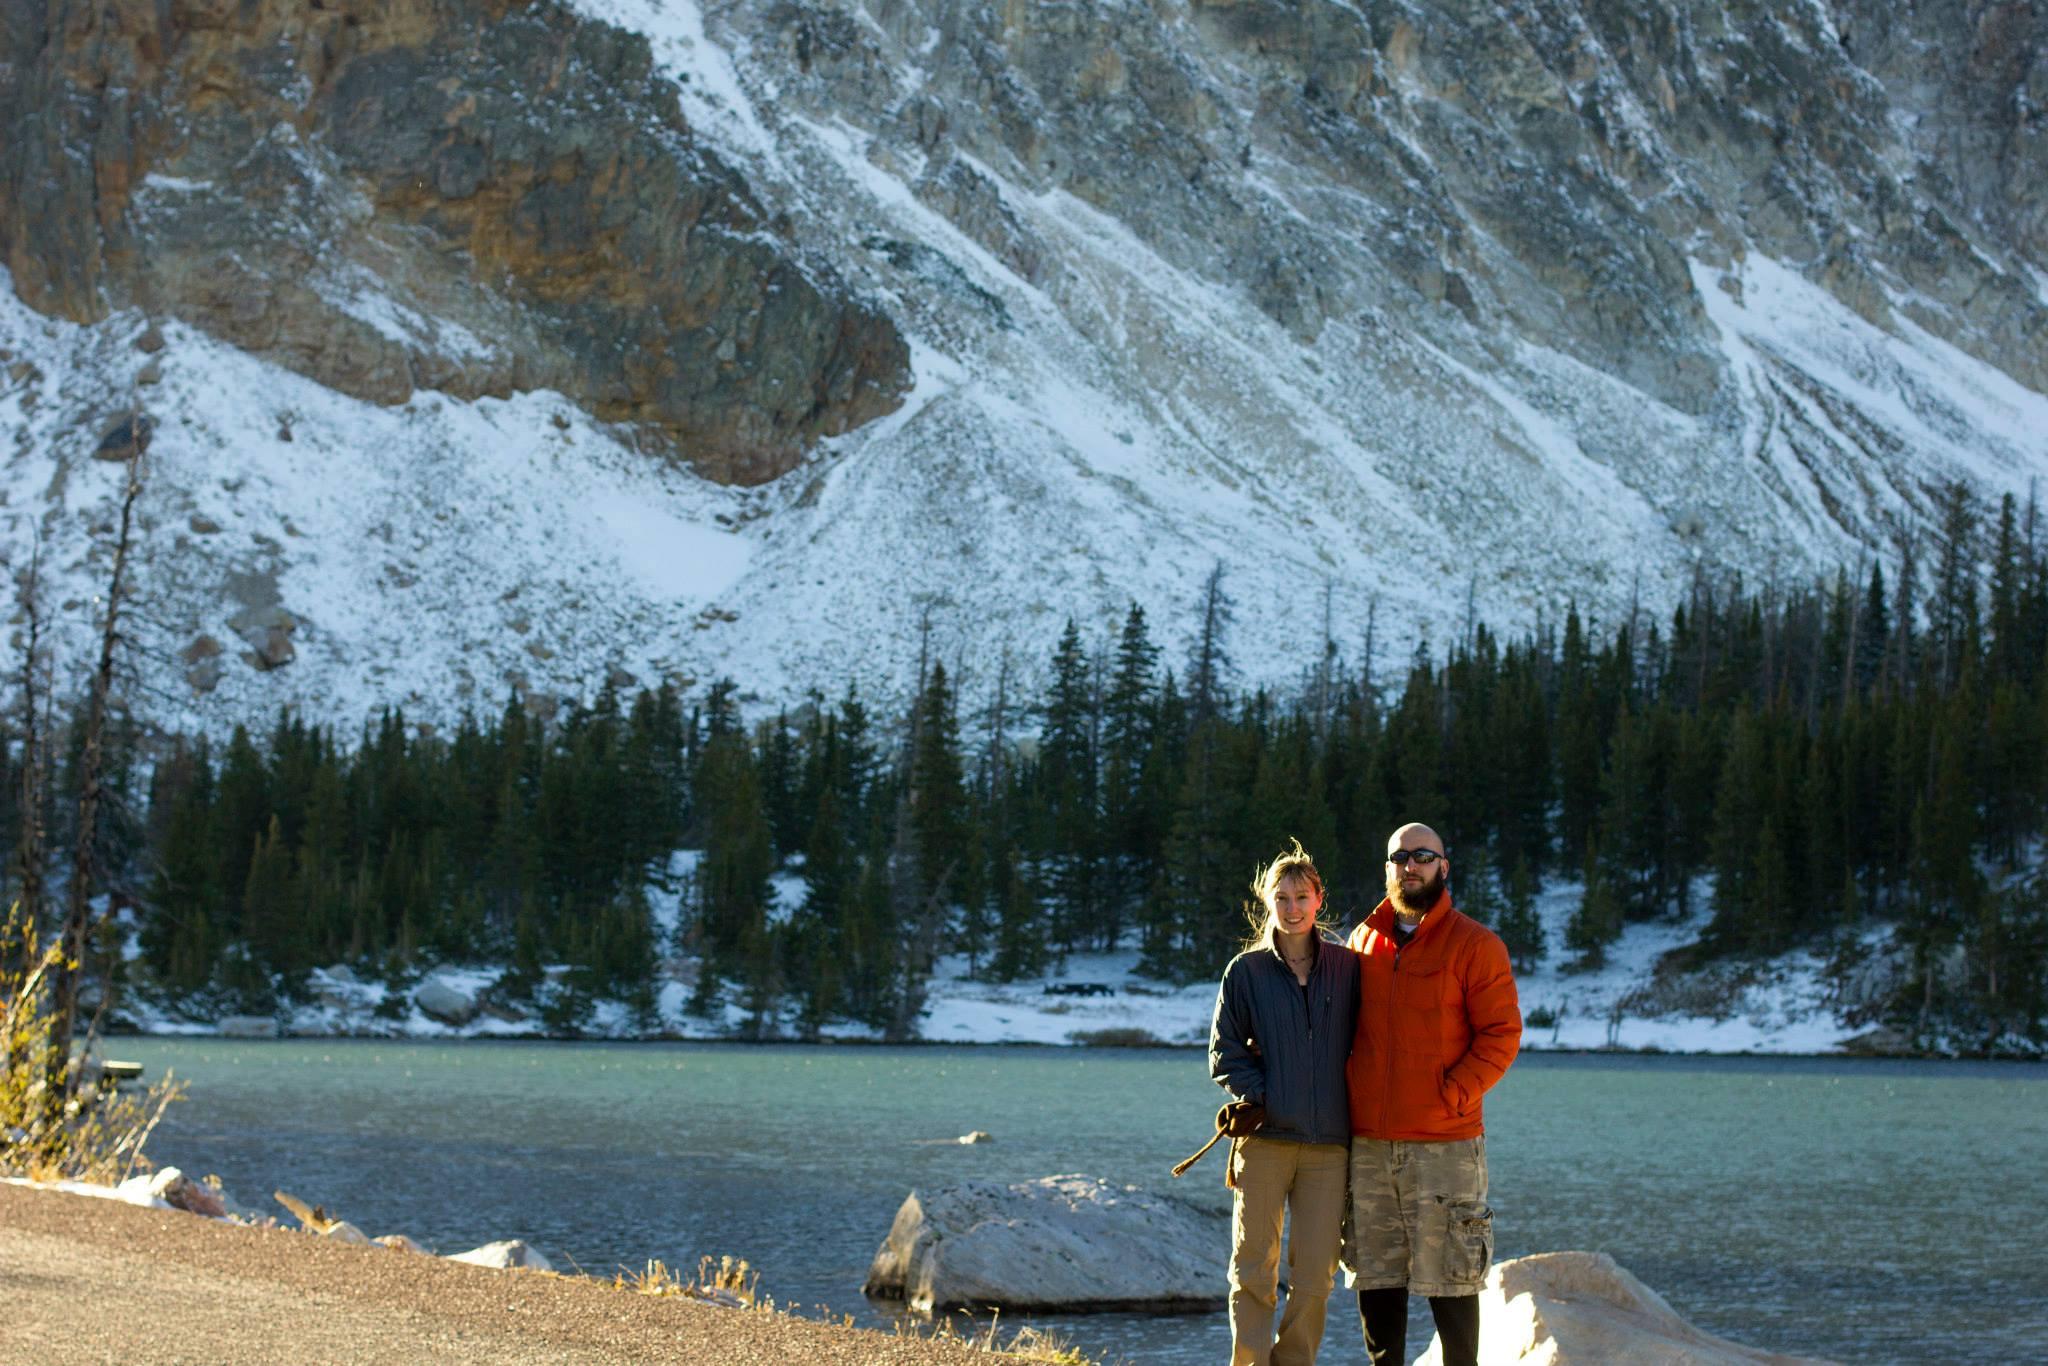 Amie and Steve at Mirror Lake